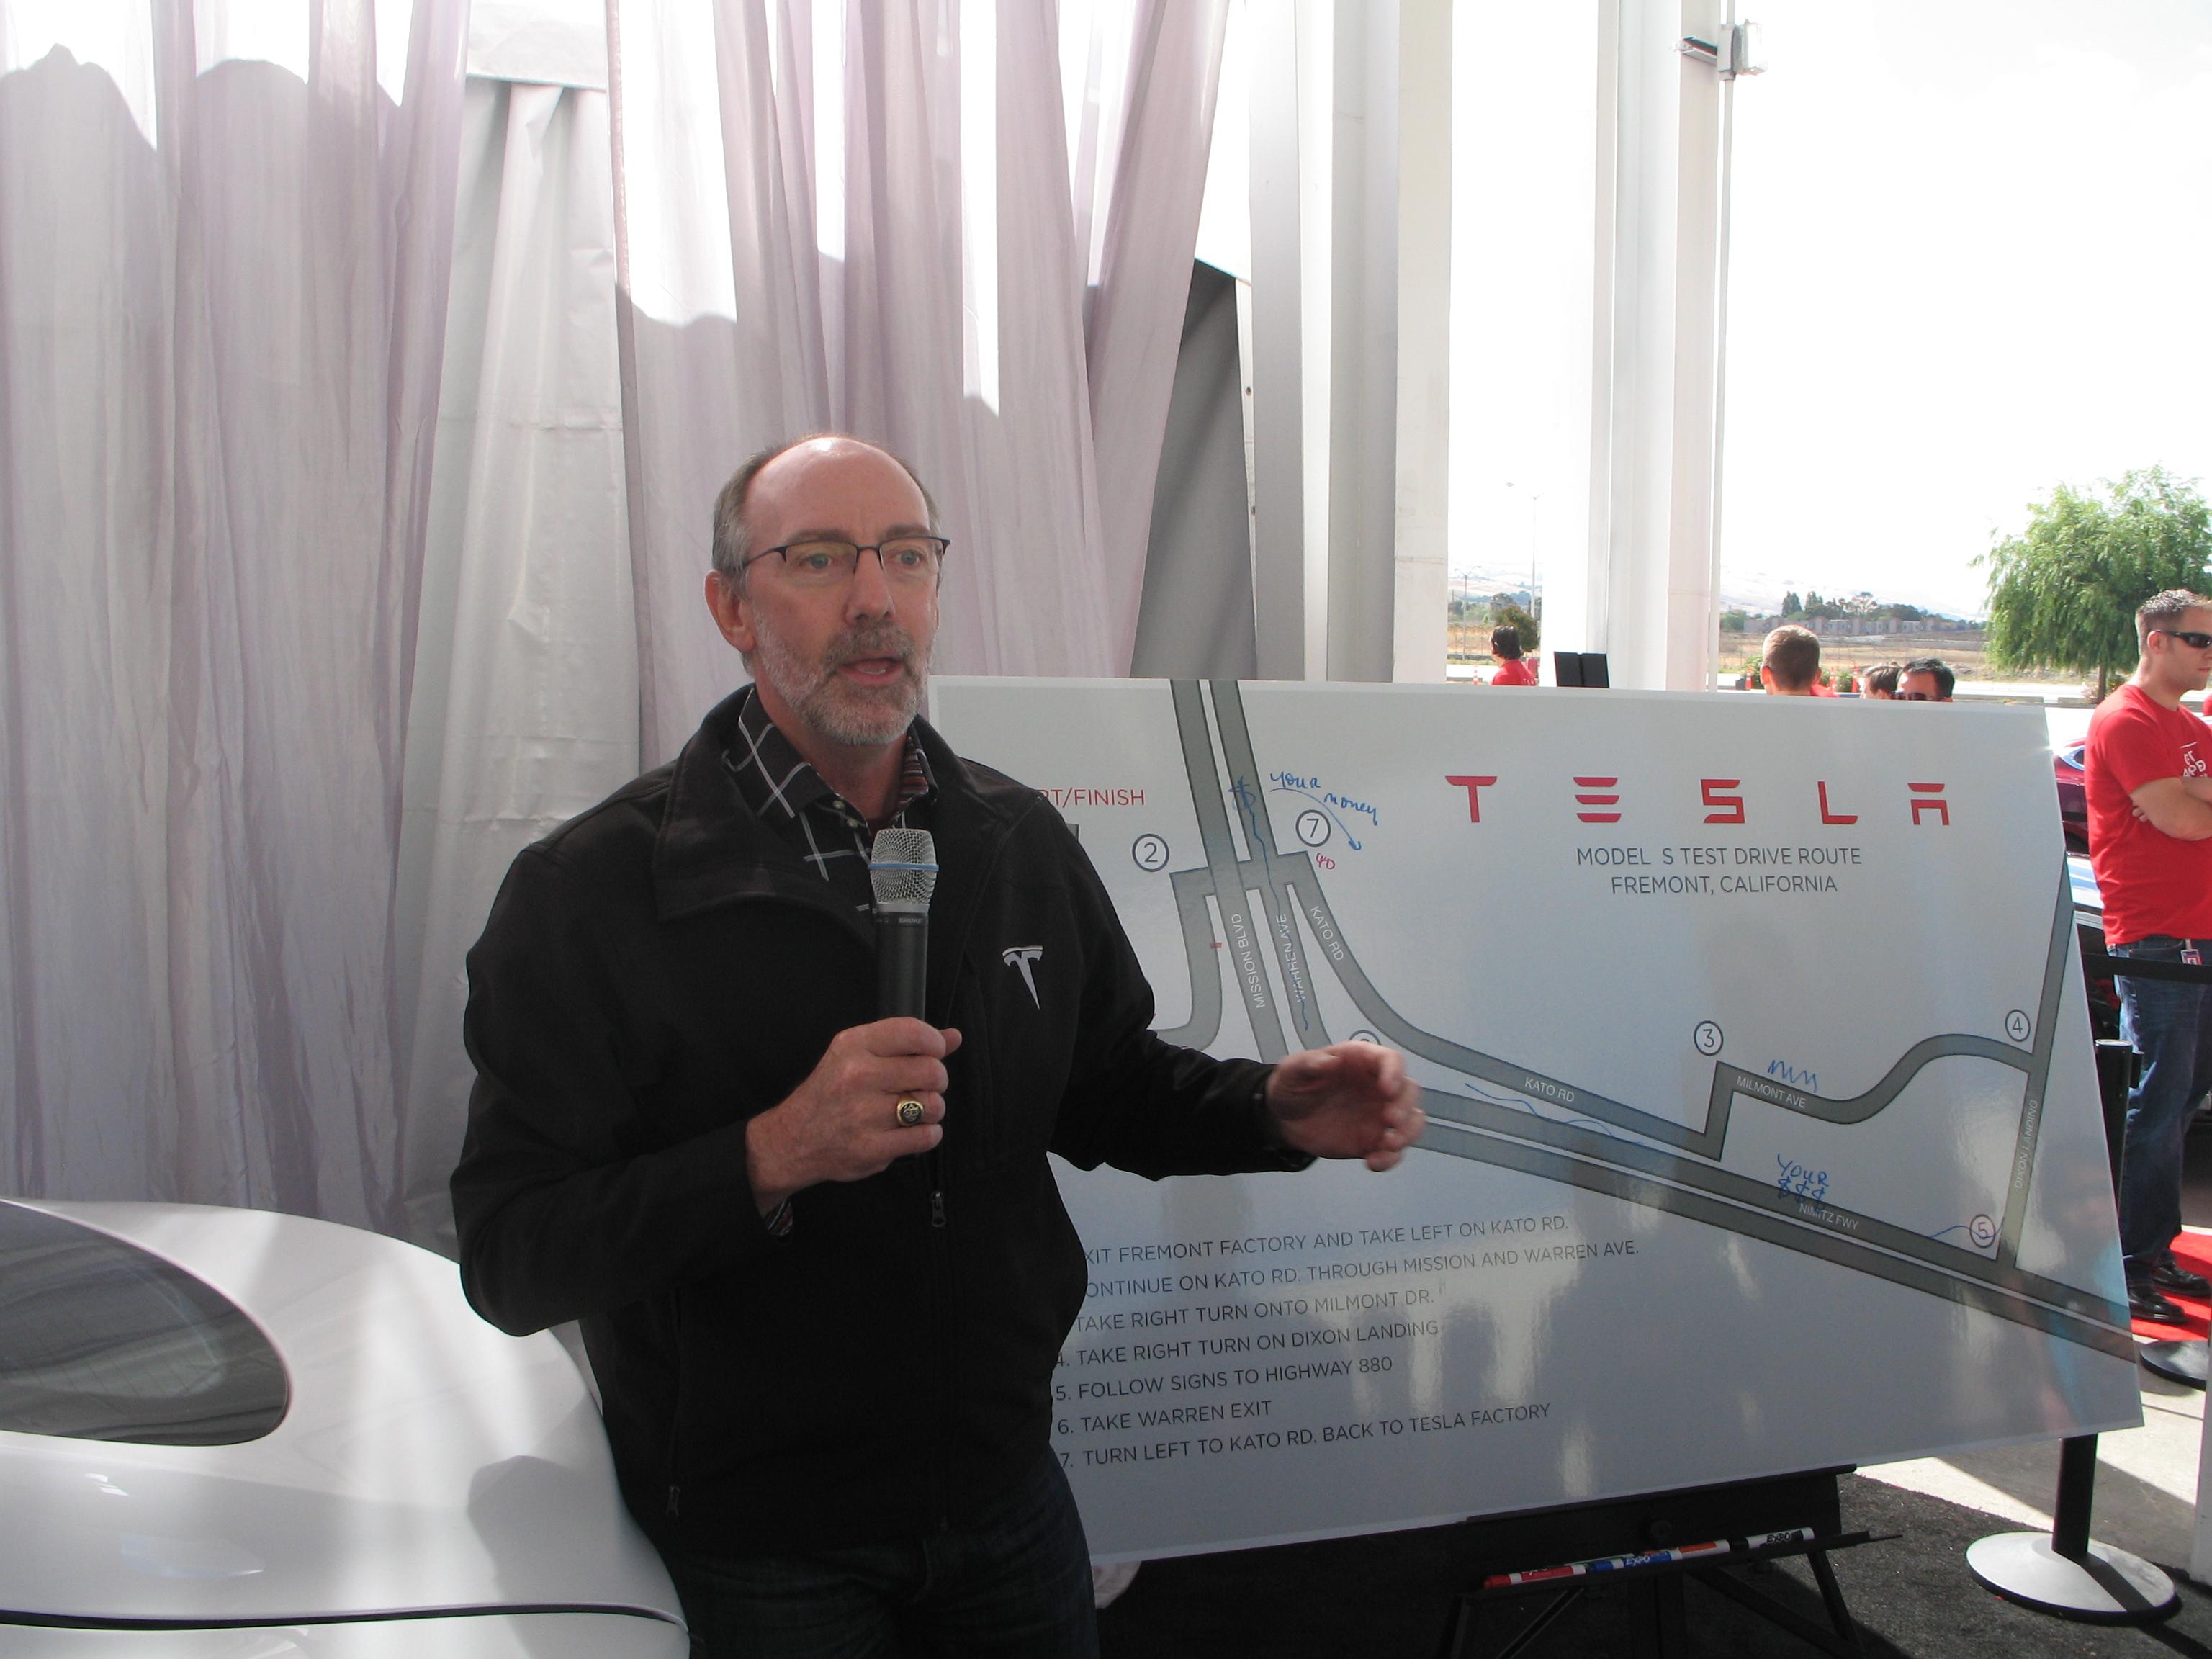 Tesla Get Amped 020.JPG